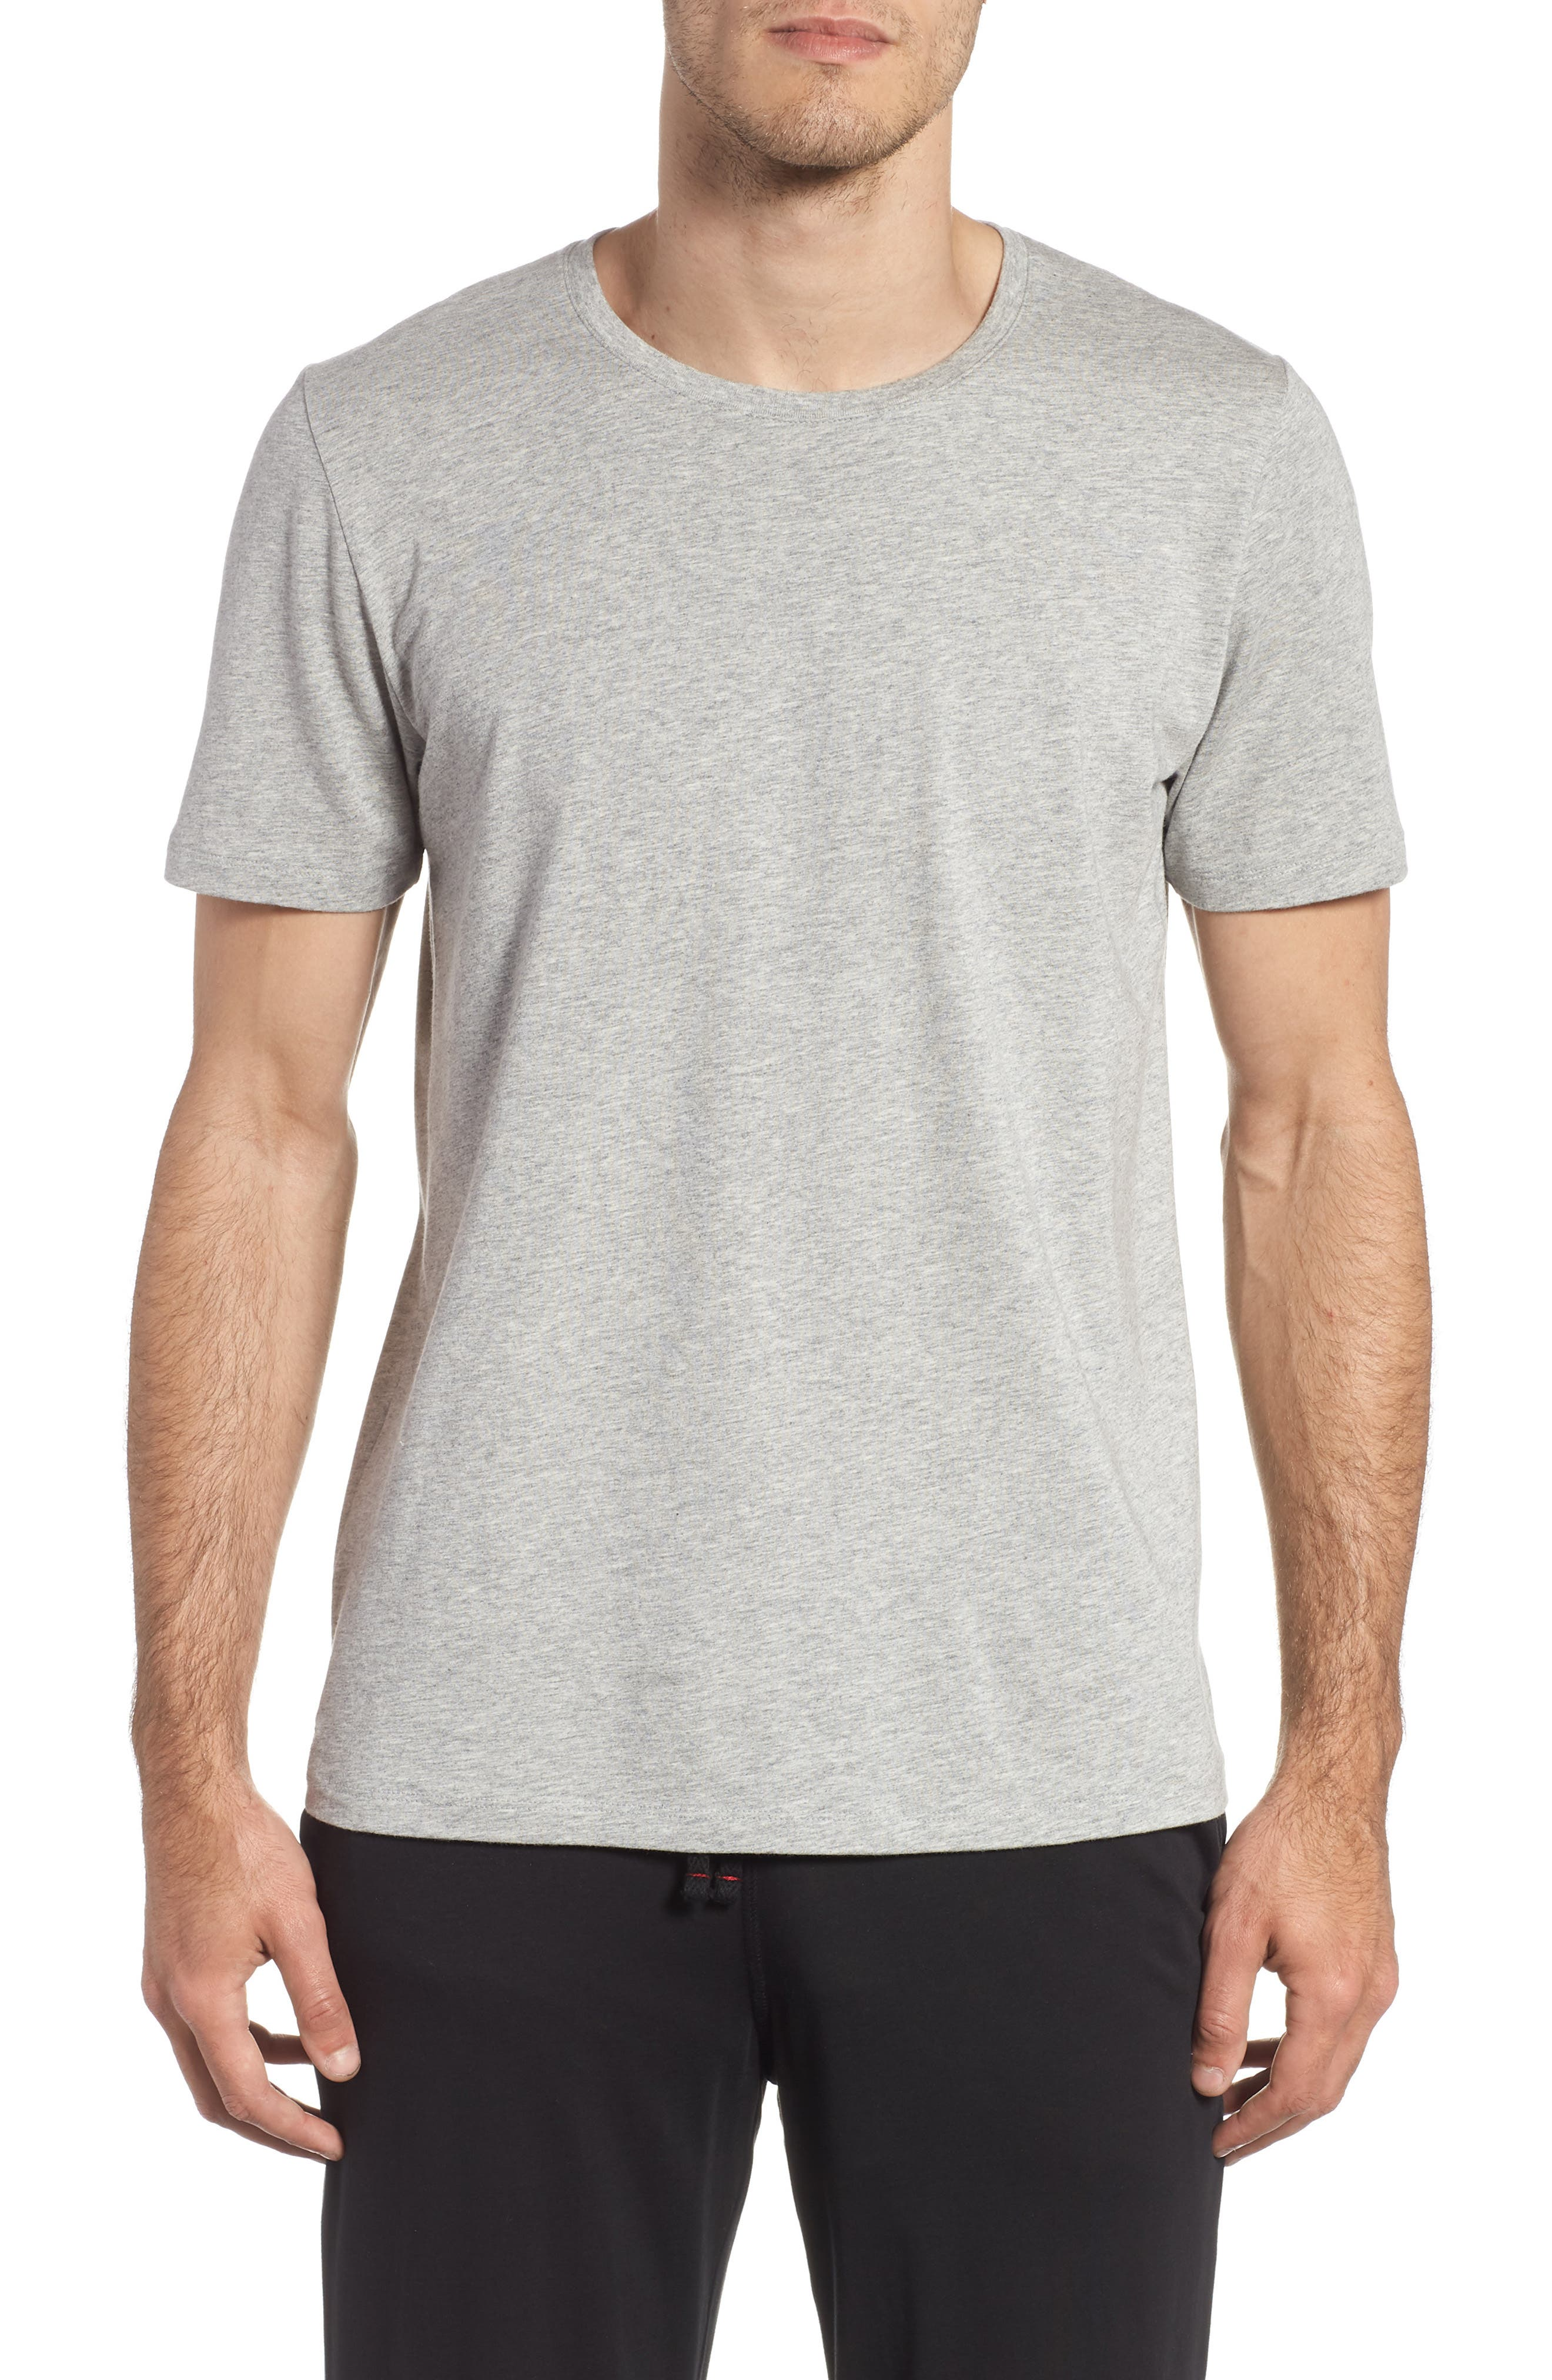 Second Skin Crewneck T-Shirt,                         Main,                         color, HEATHER GREY